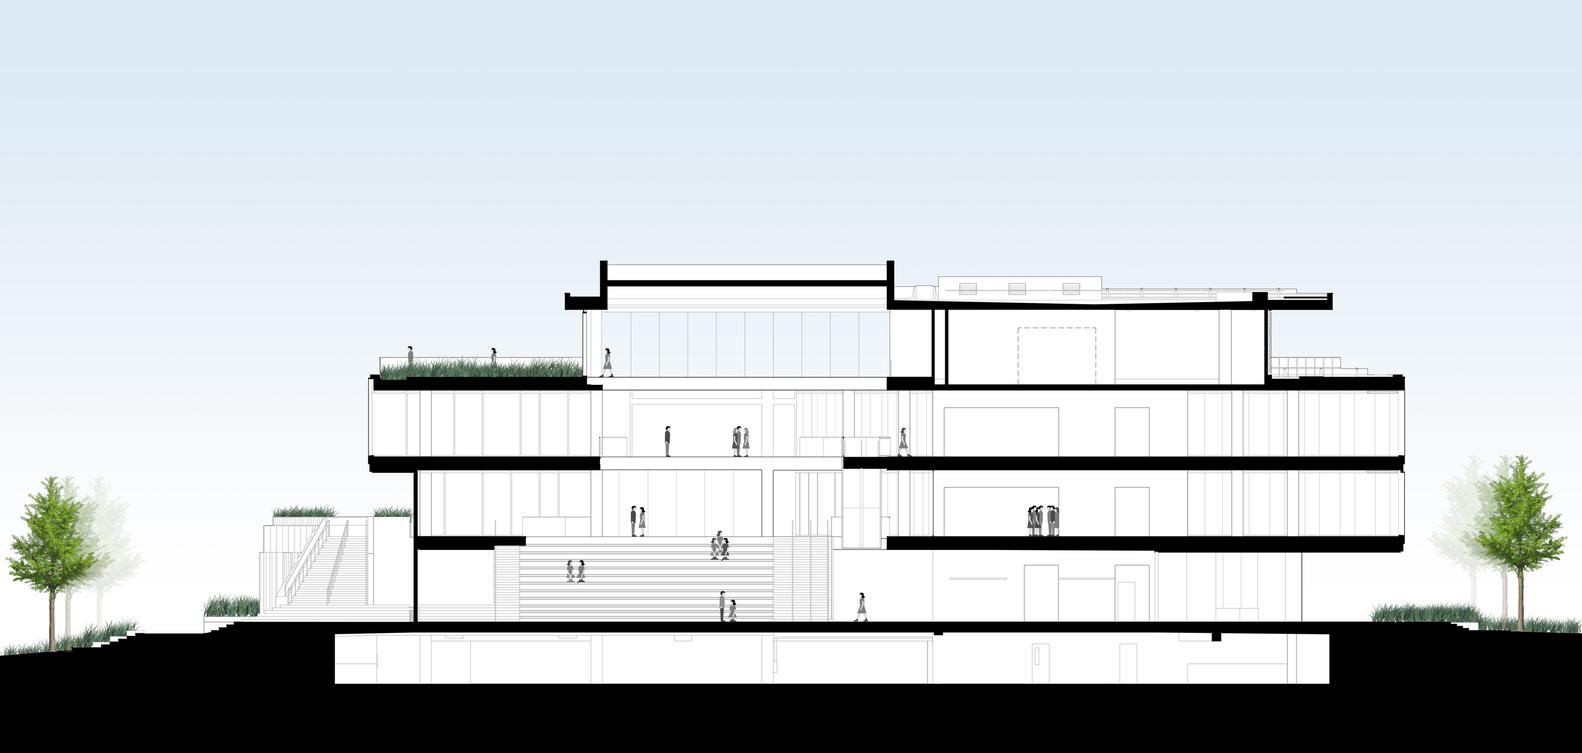 Intuit海洋路大廈——探索可持續的公共參與型發展模式插图22